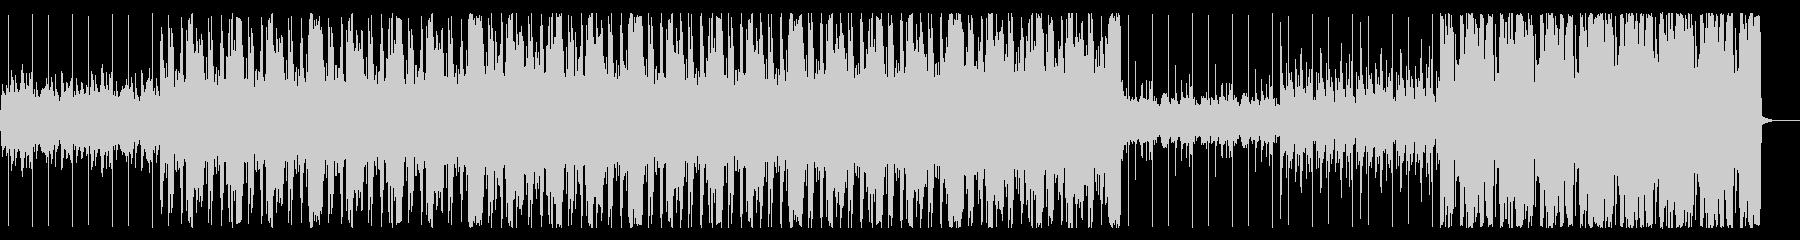 Electronica/Dark/Ambの未再生の波形